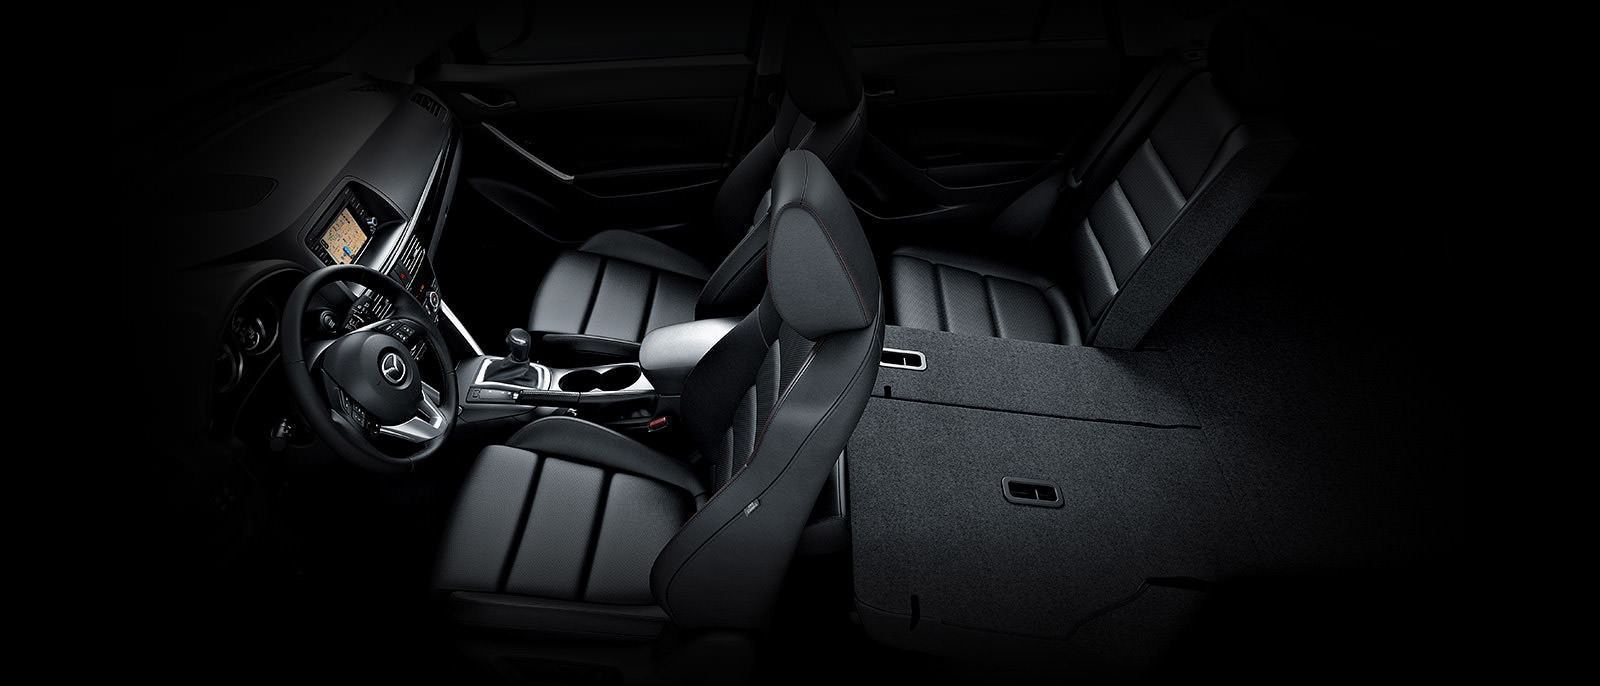 2015 Mazda CX-5 Cargo